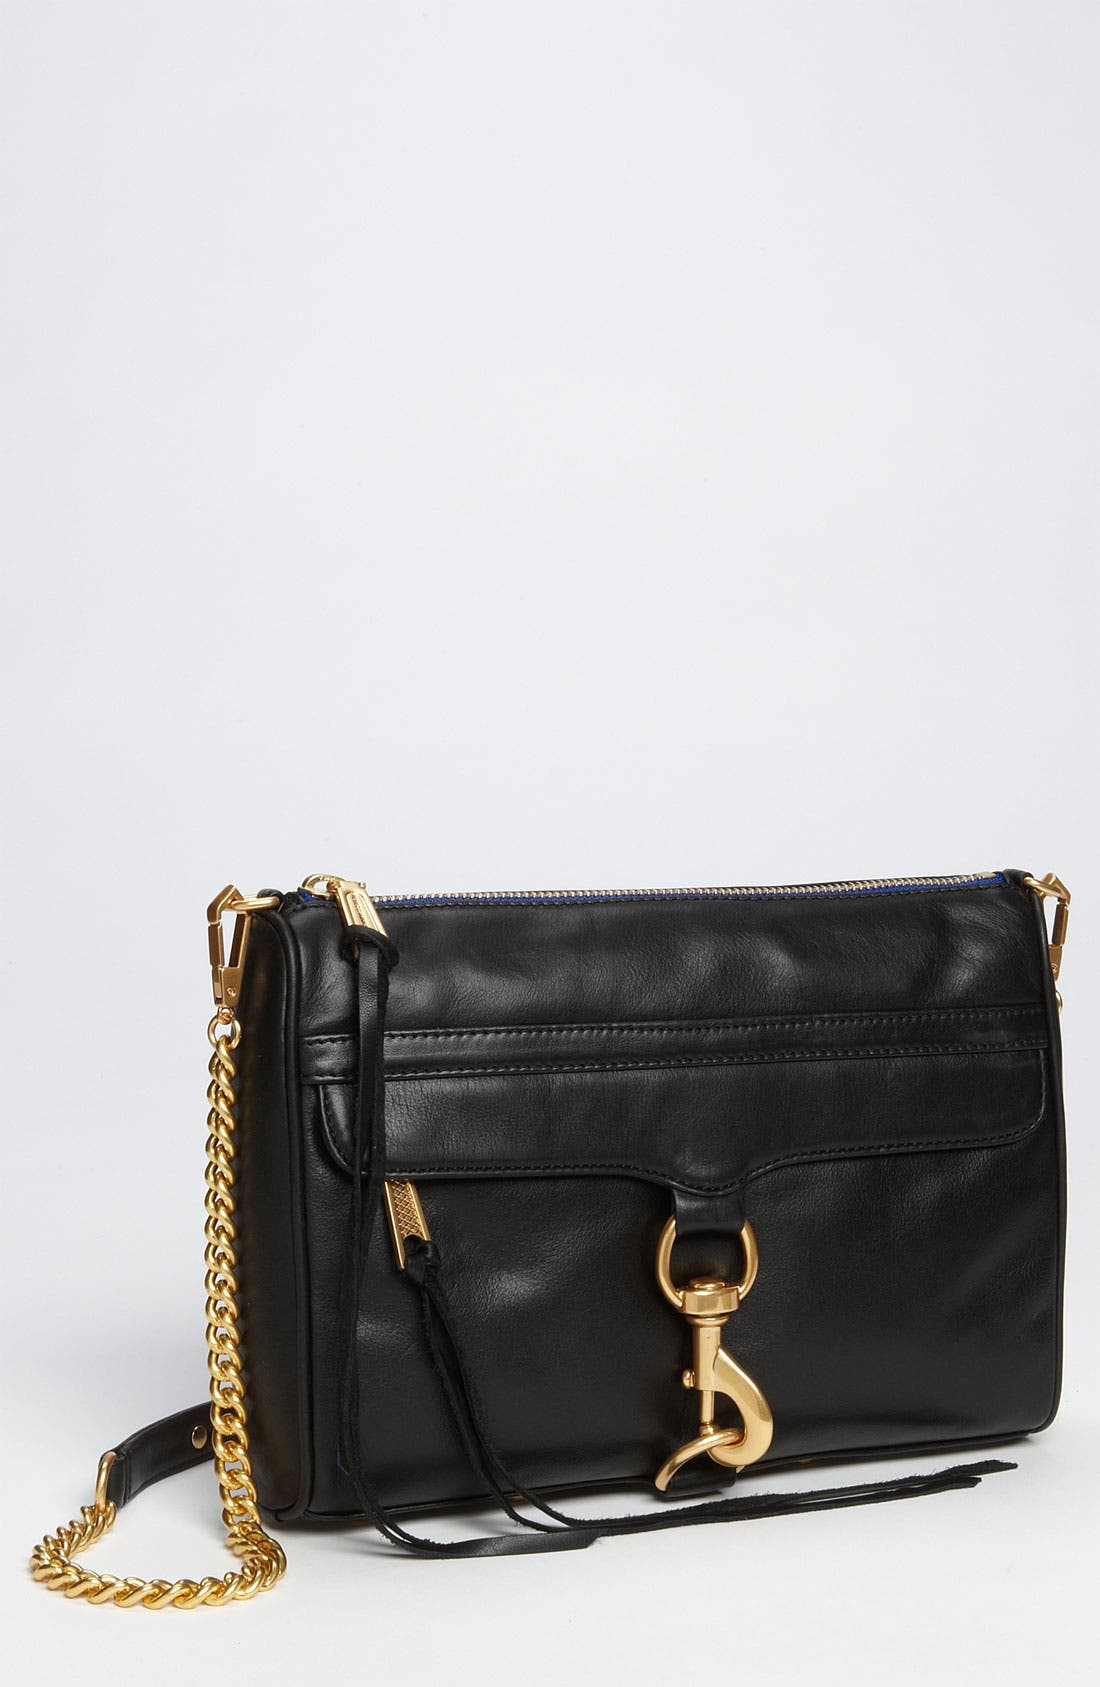 Main Image - Rebecca Minkoff 'MAC' Shoulder Bag